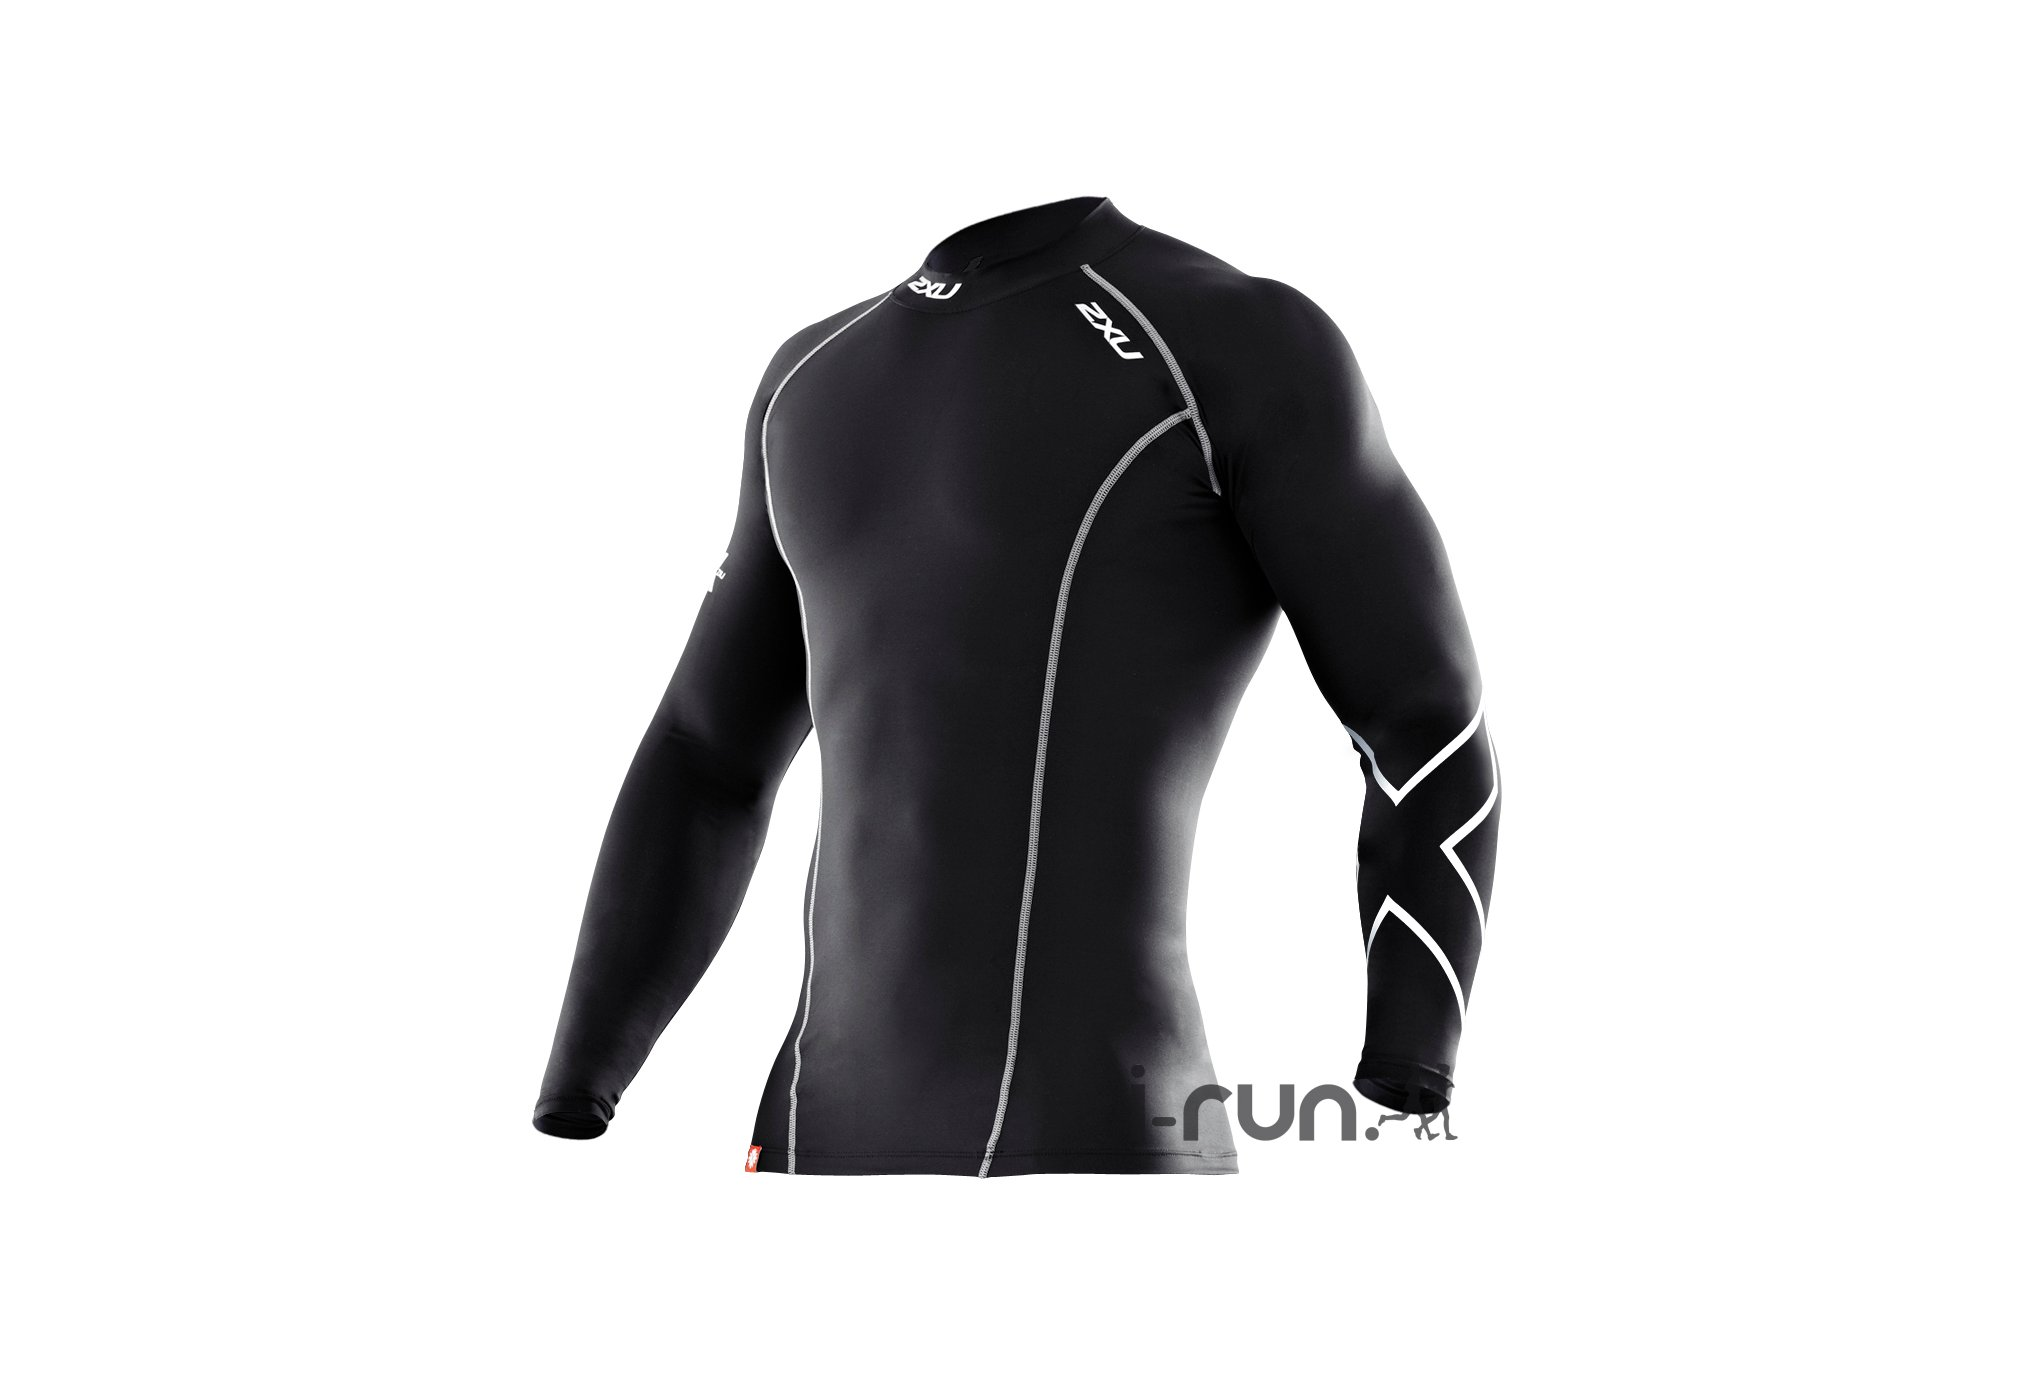 2xu Tee-Shirt l/s xform compression m vêtement running homme